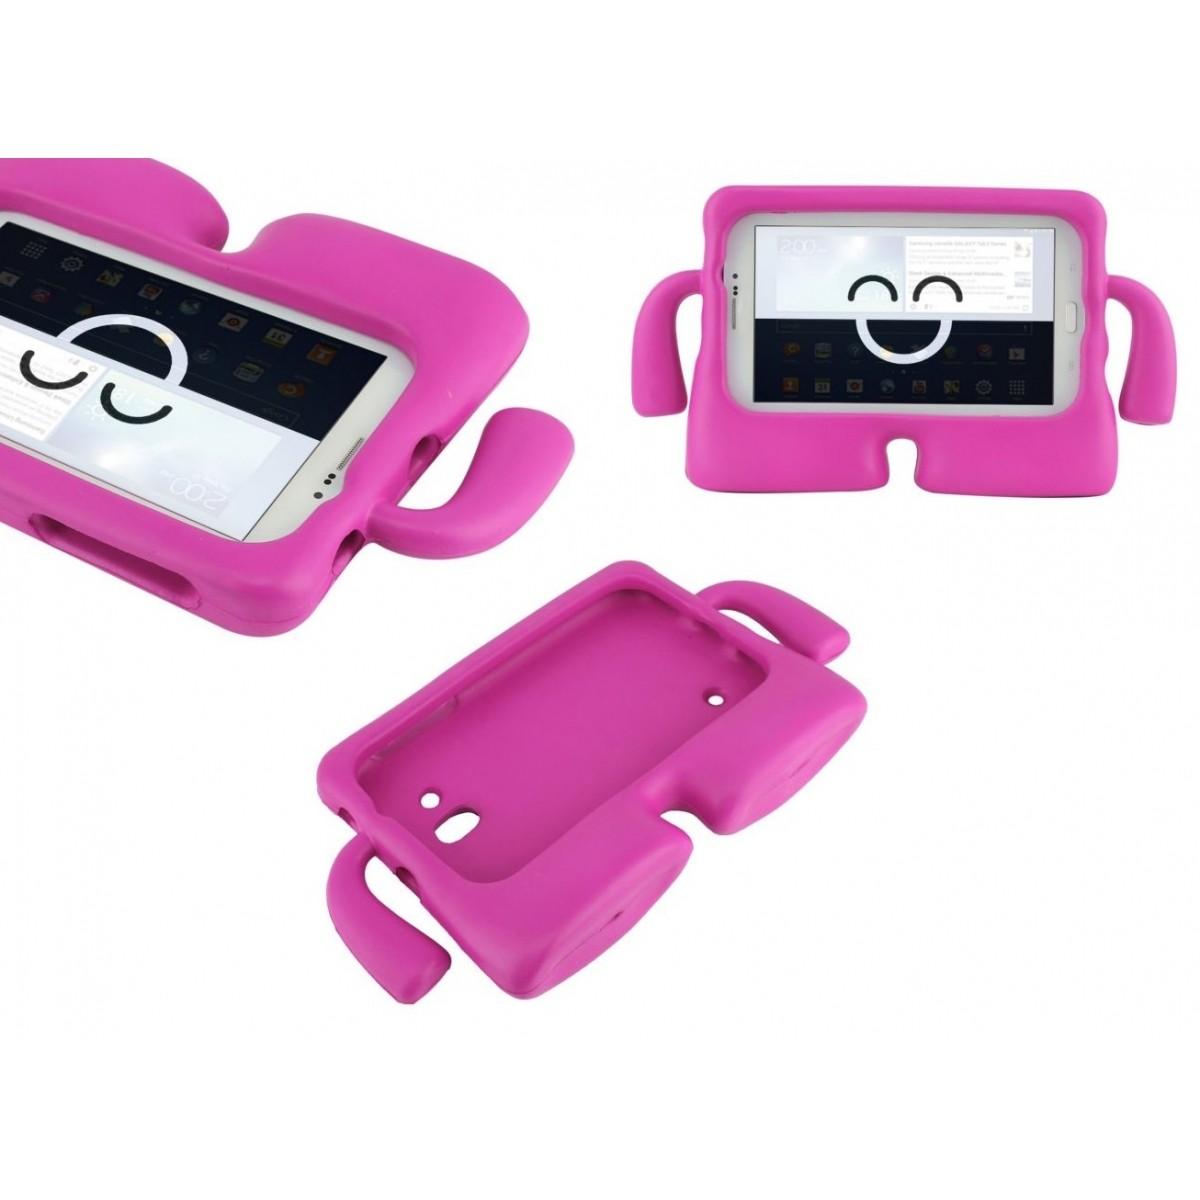 ... Capa Tablet Samsung Galaxy Tab 7 Polegadas Anti Impacto Infantil iGuy  ... a2898caa09